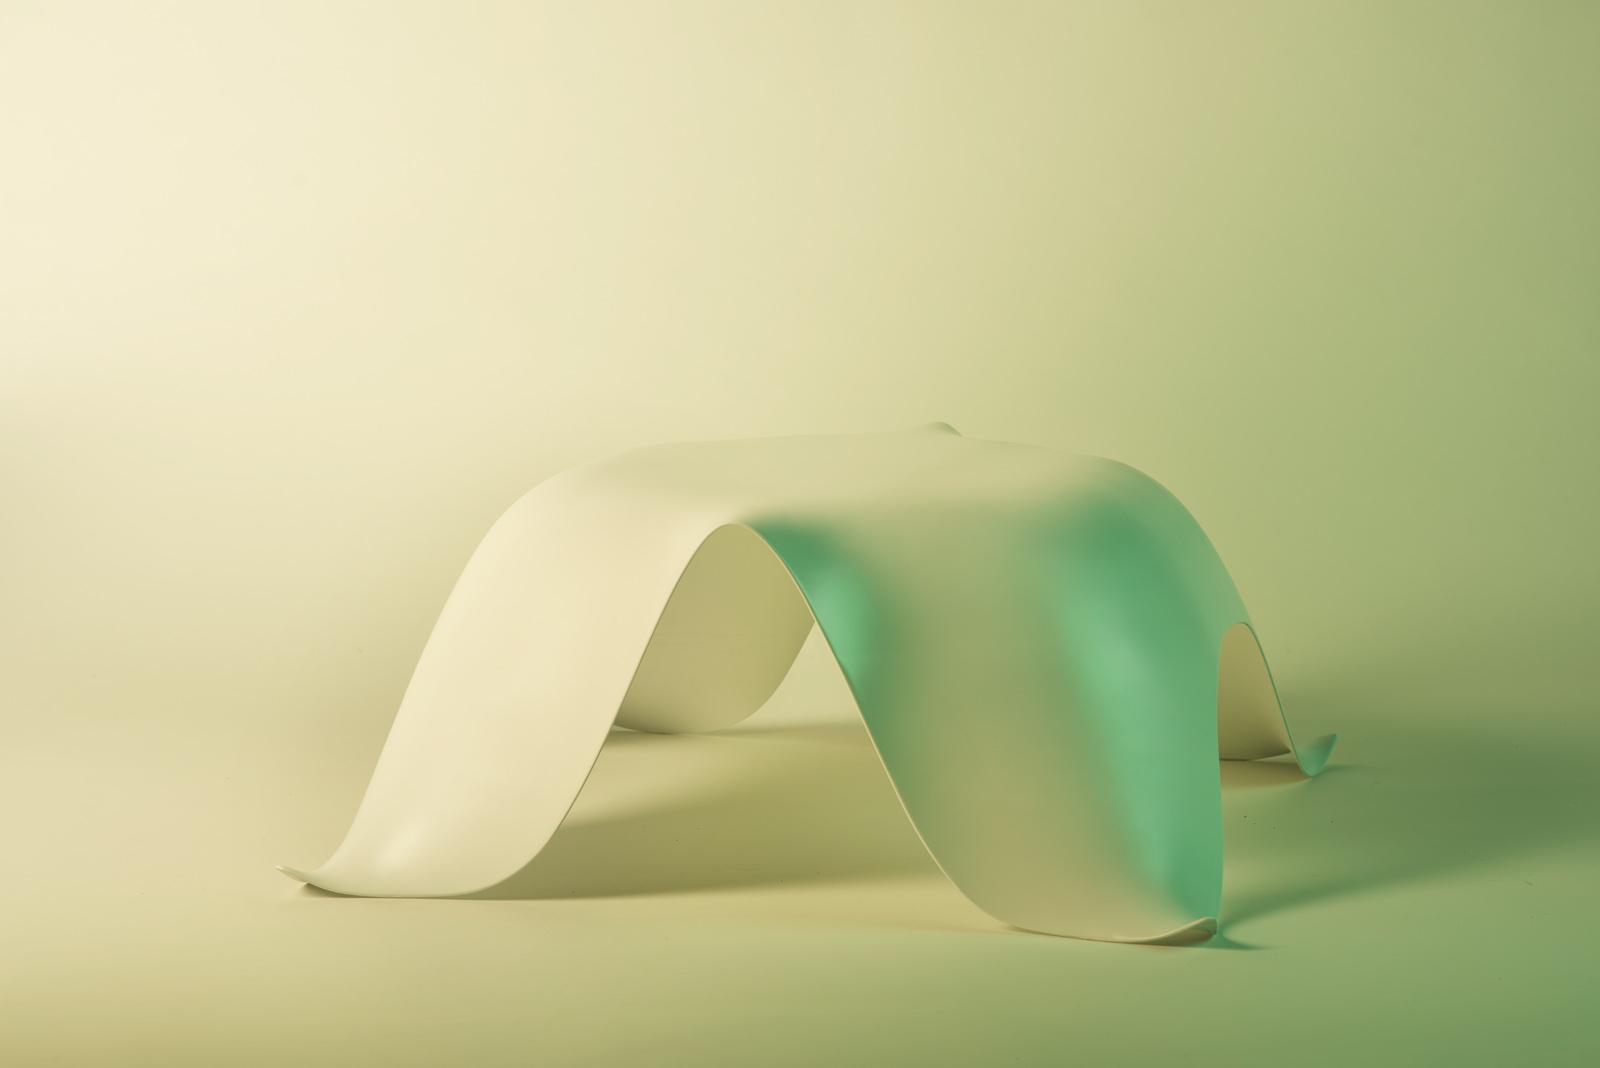 Flip by Ji Eun Kang, coffee table